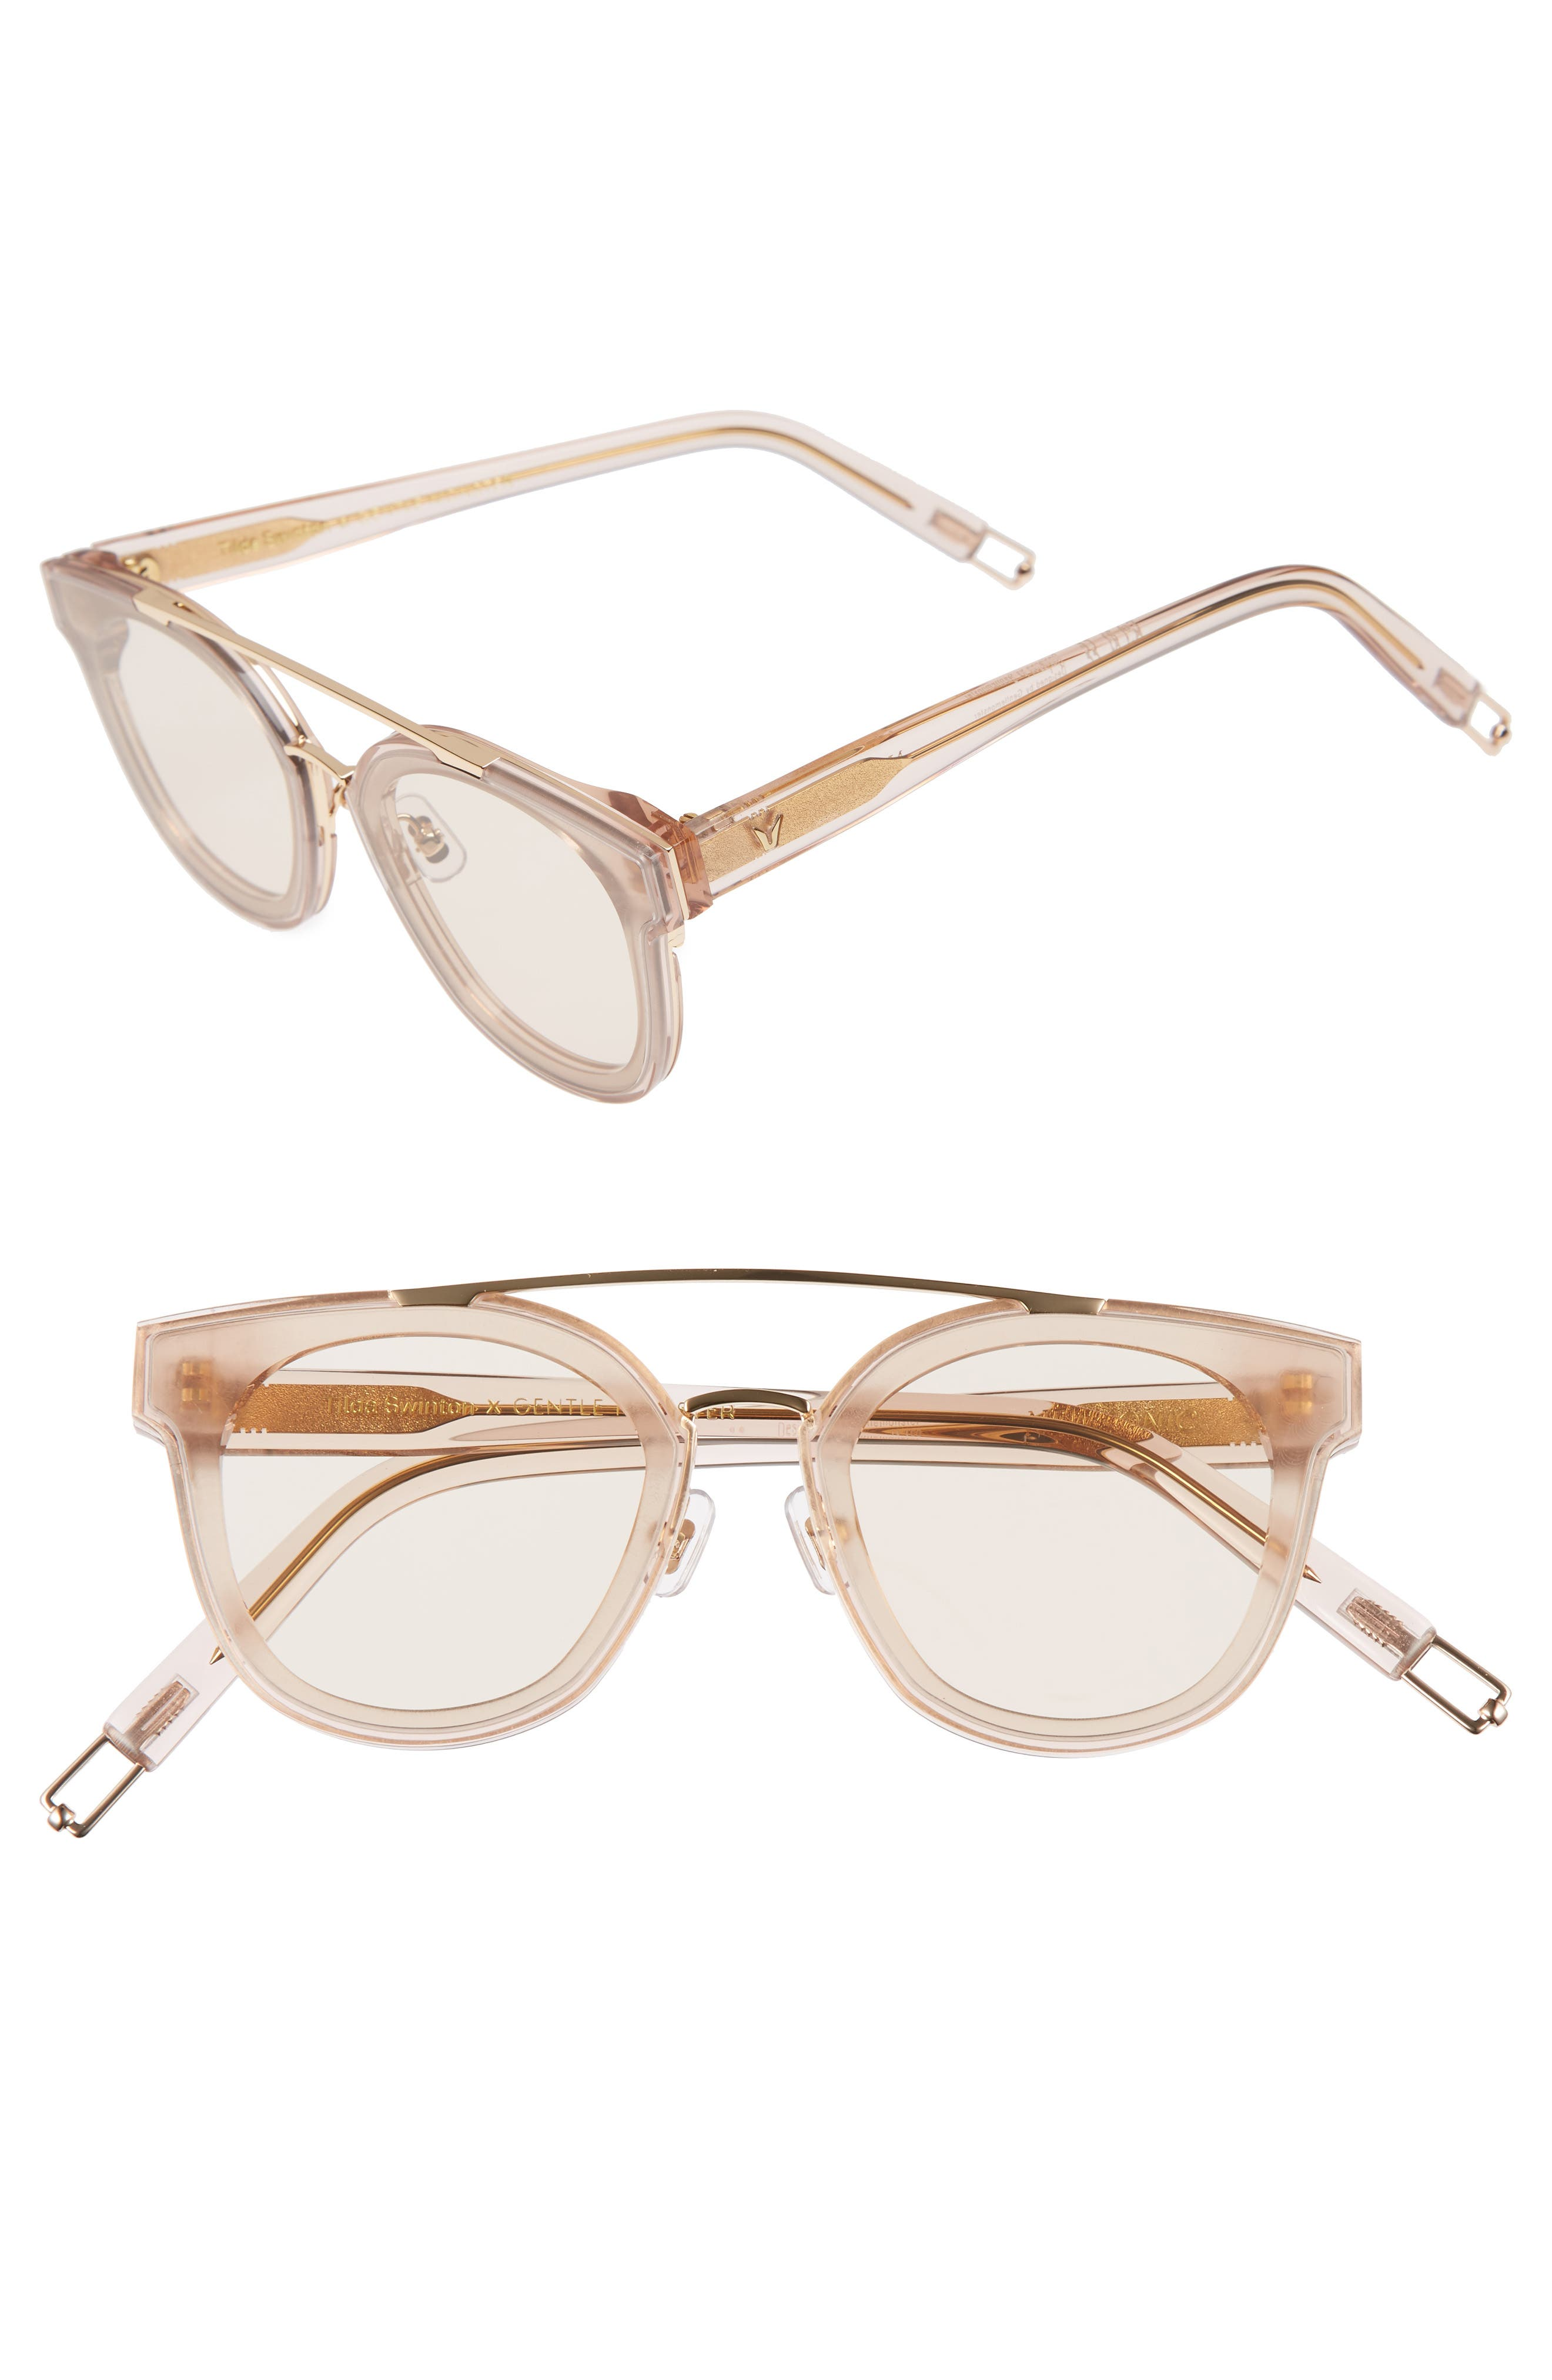 Tilda Swinton x Gentle Monster Newtonic 60mm Rounded Sunglasses,                             Main thumbnail 2, color,